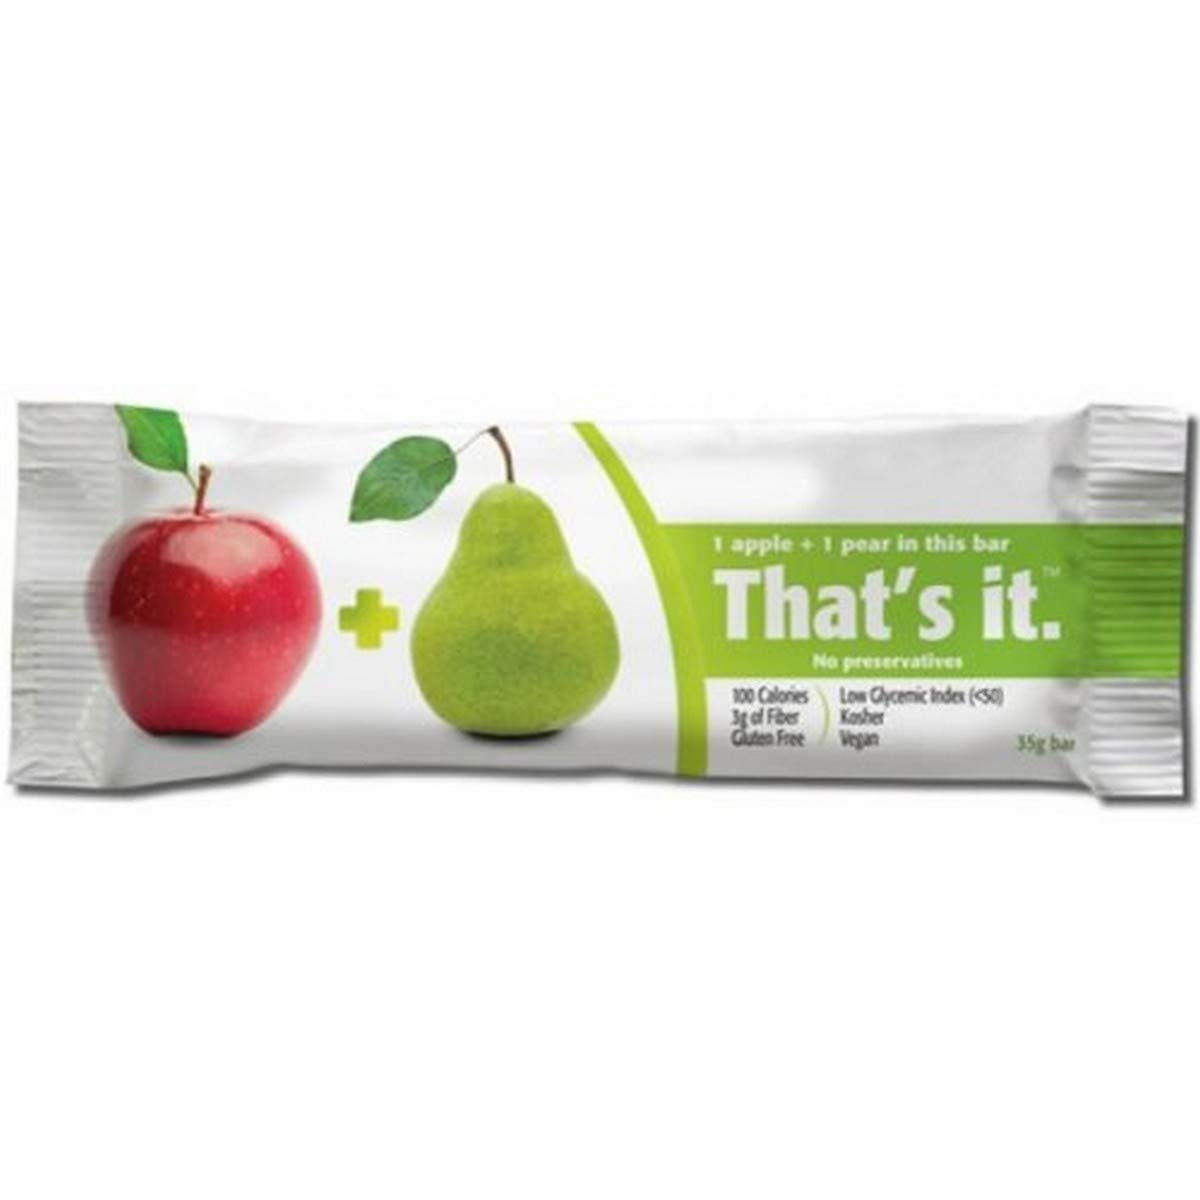 THATS IT FRUIT BAR APPLE PEAR, (12 Count of 1.2 oz Bars) 14.4 oz